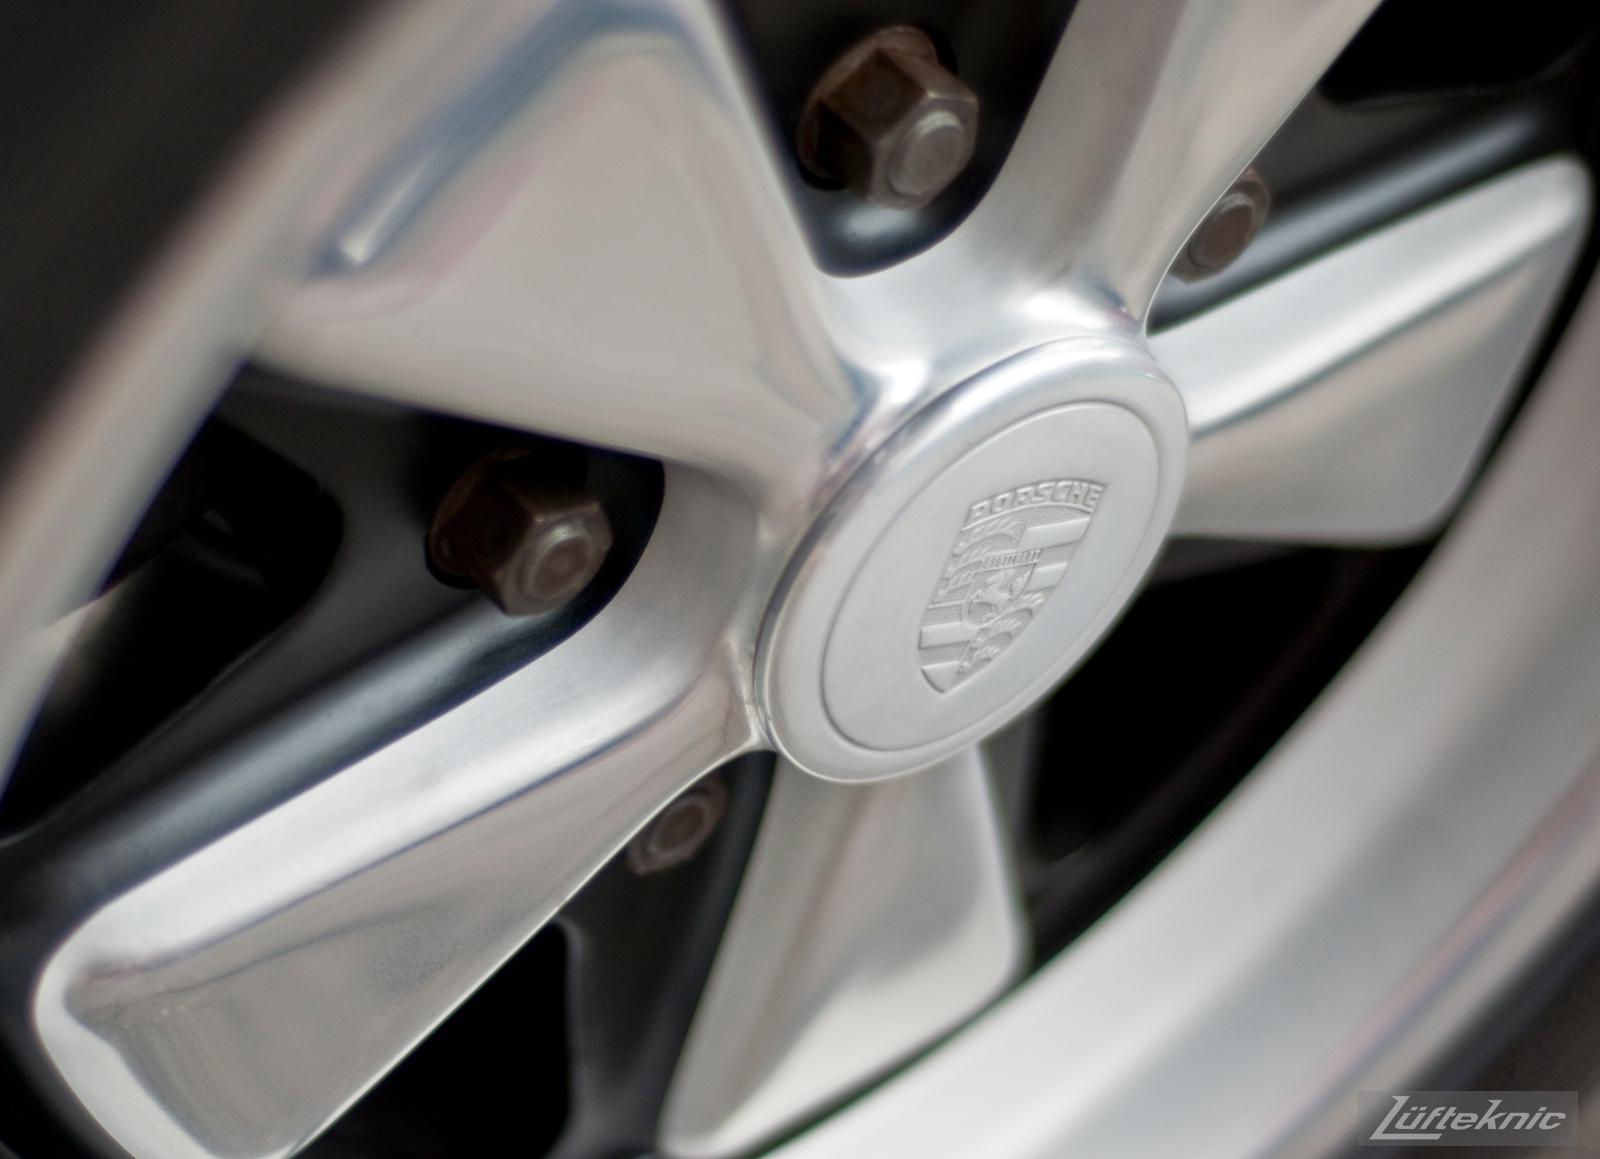 A close up picture of a Porsche center cap on a Fuchs wheel